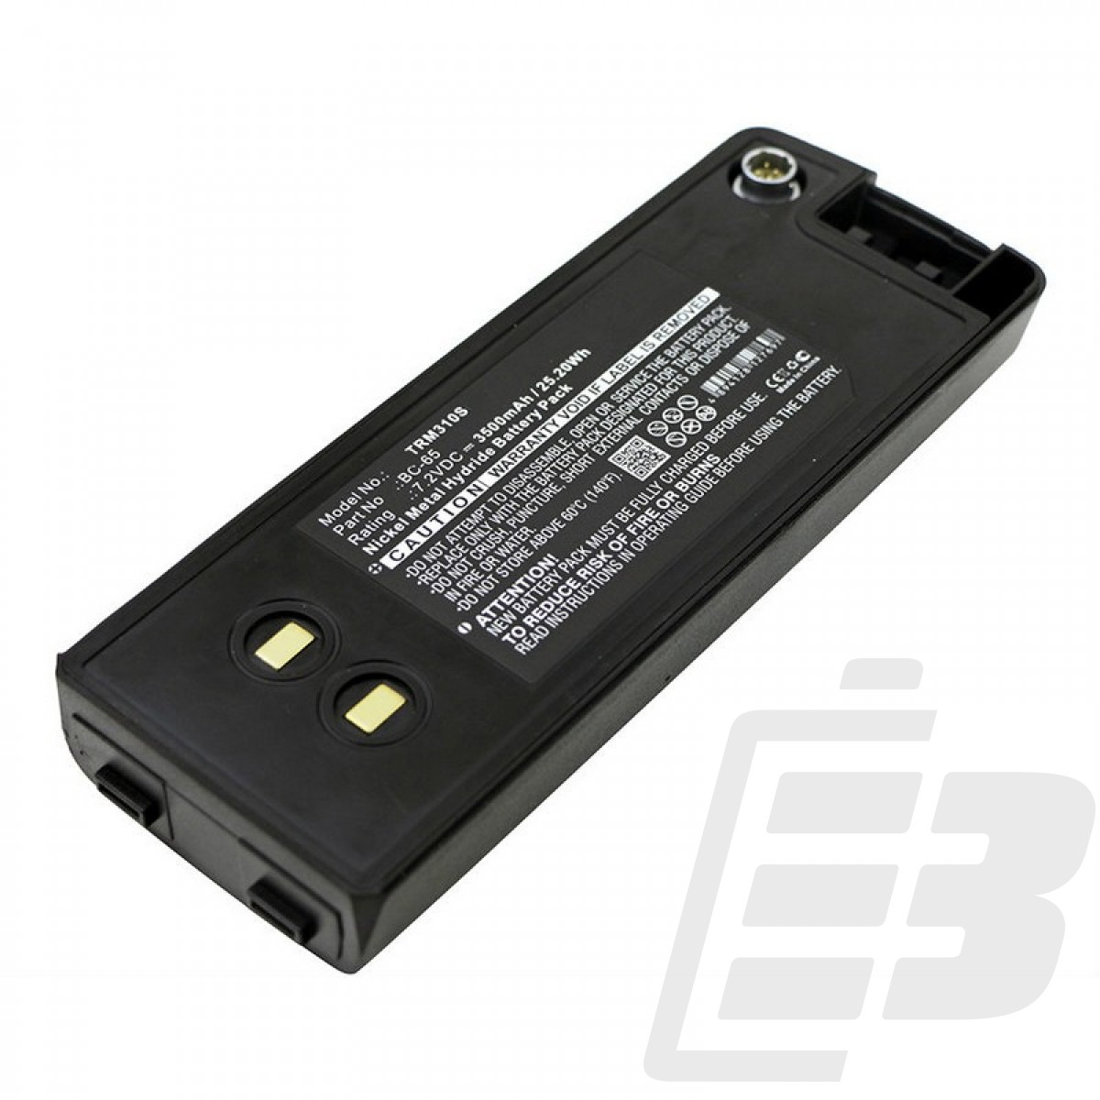 Survey tester battery Trimble Μ3_1